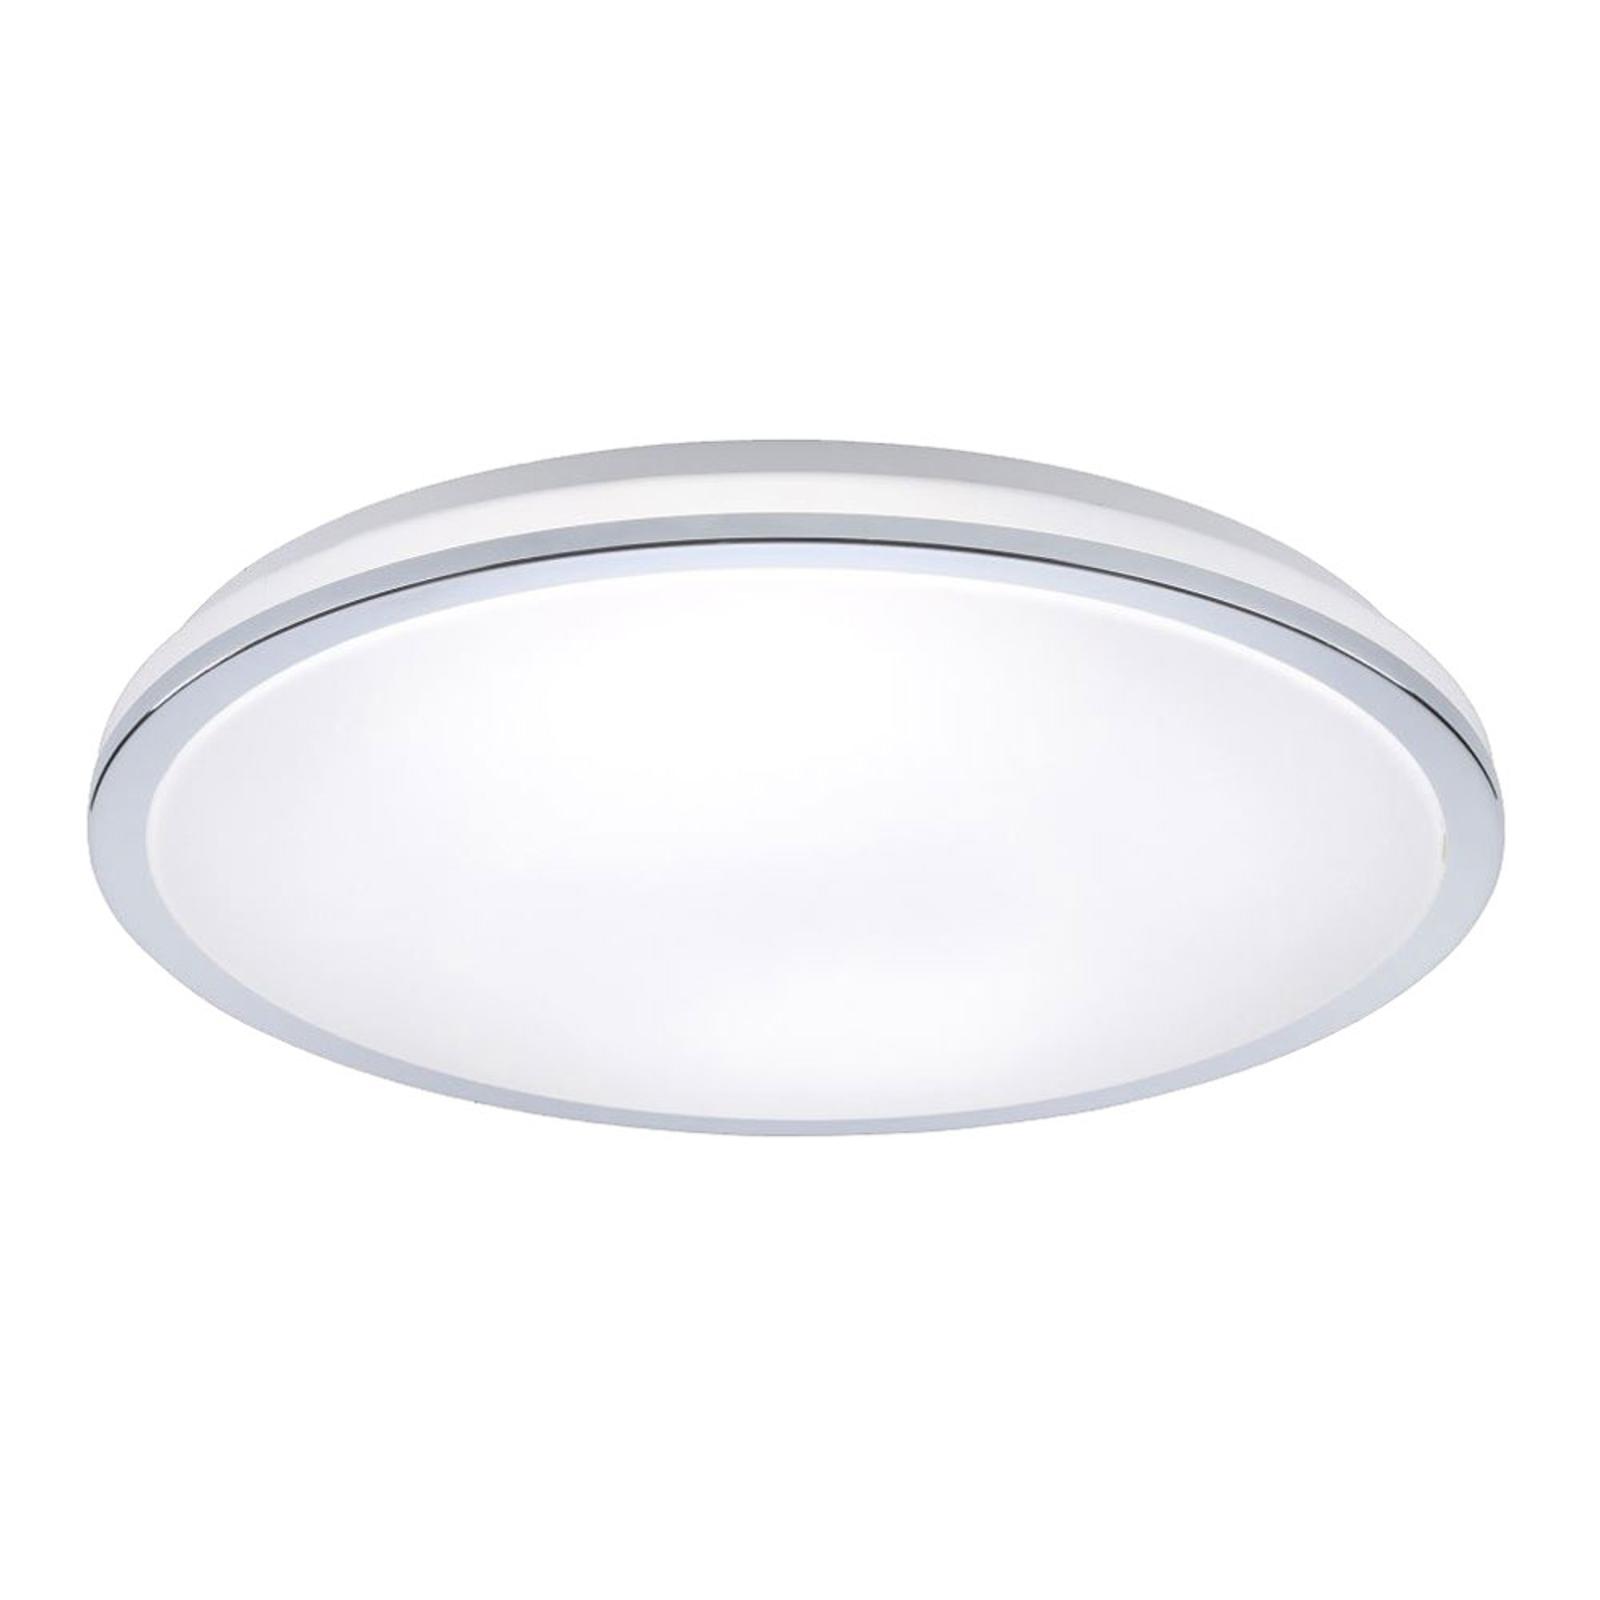 LED plafondlamp Isabell met bewegingsmelder